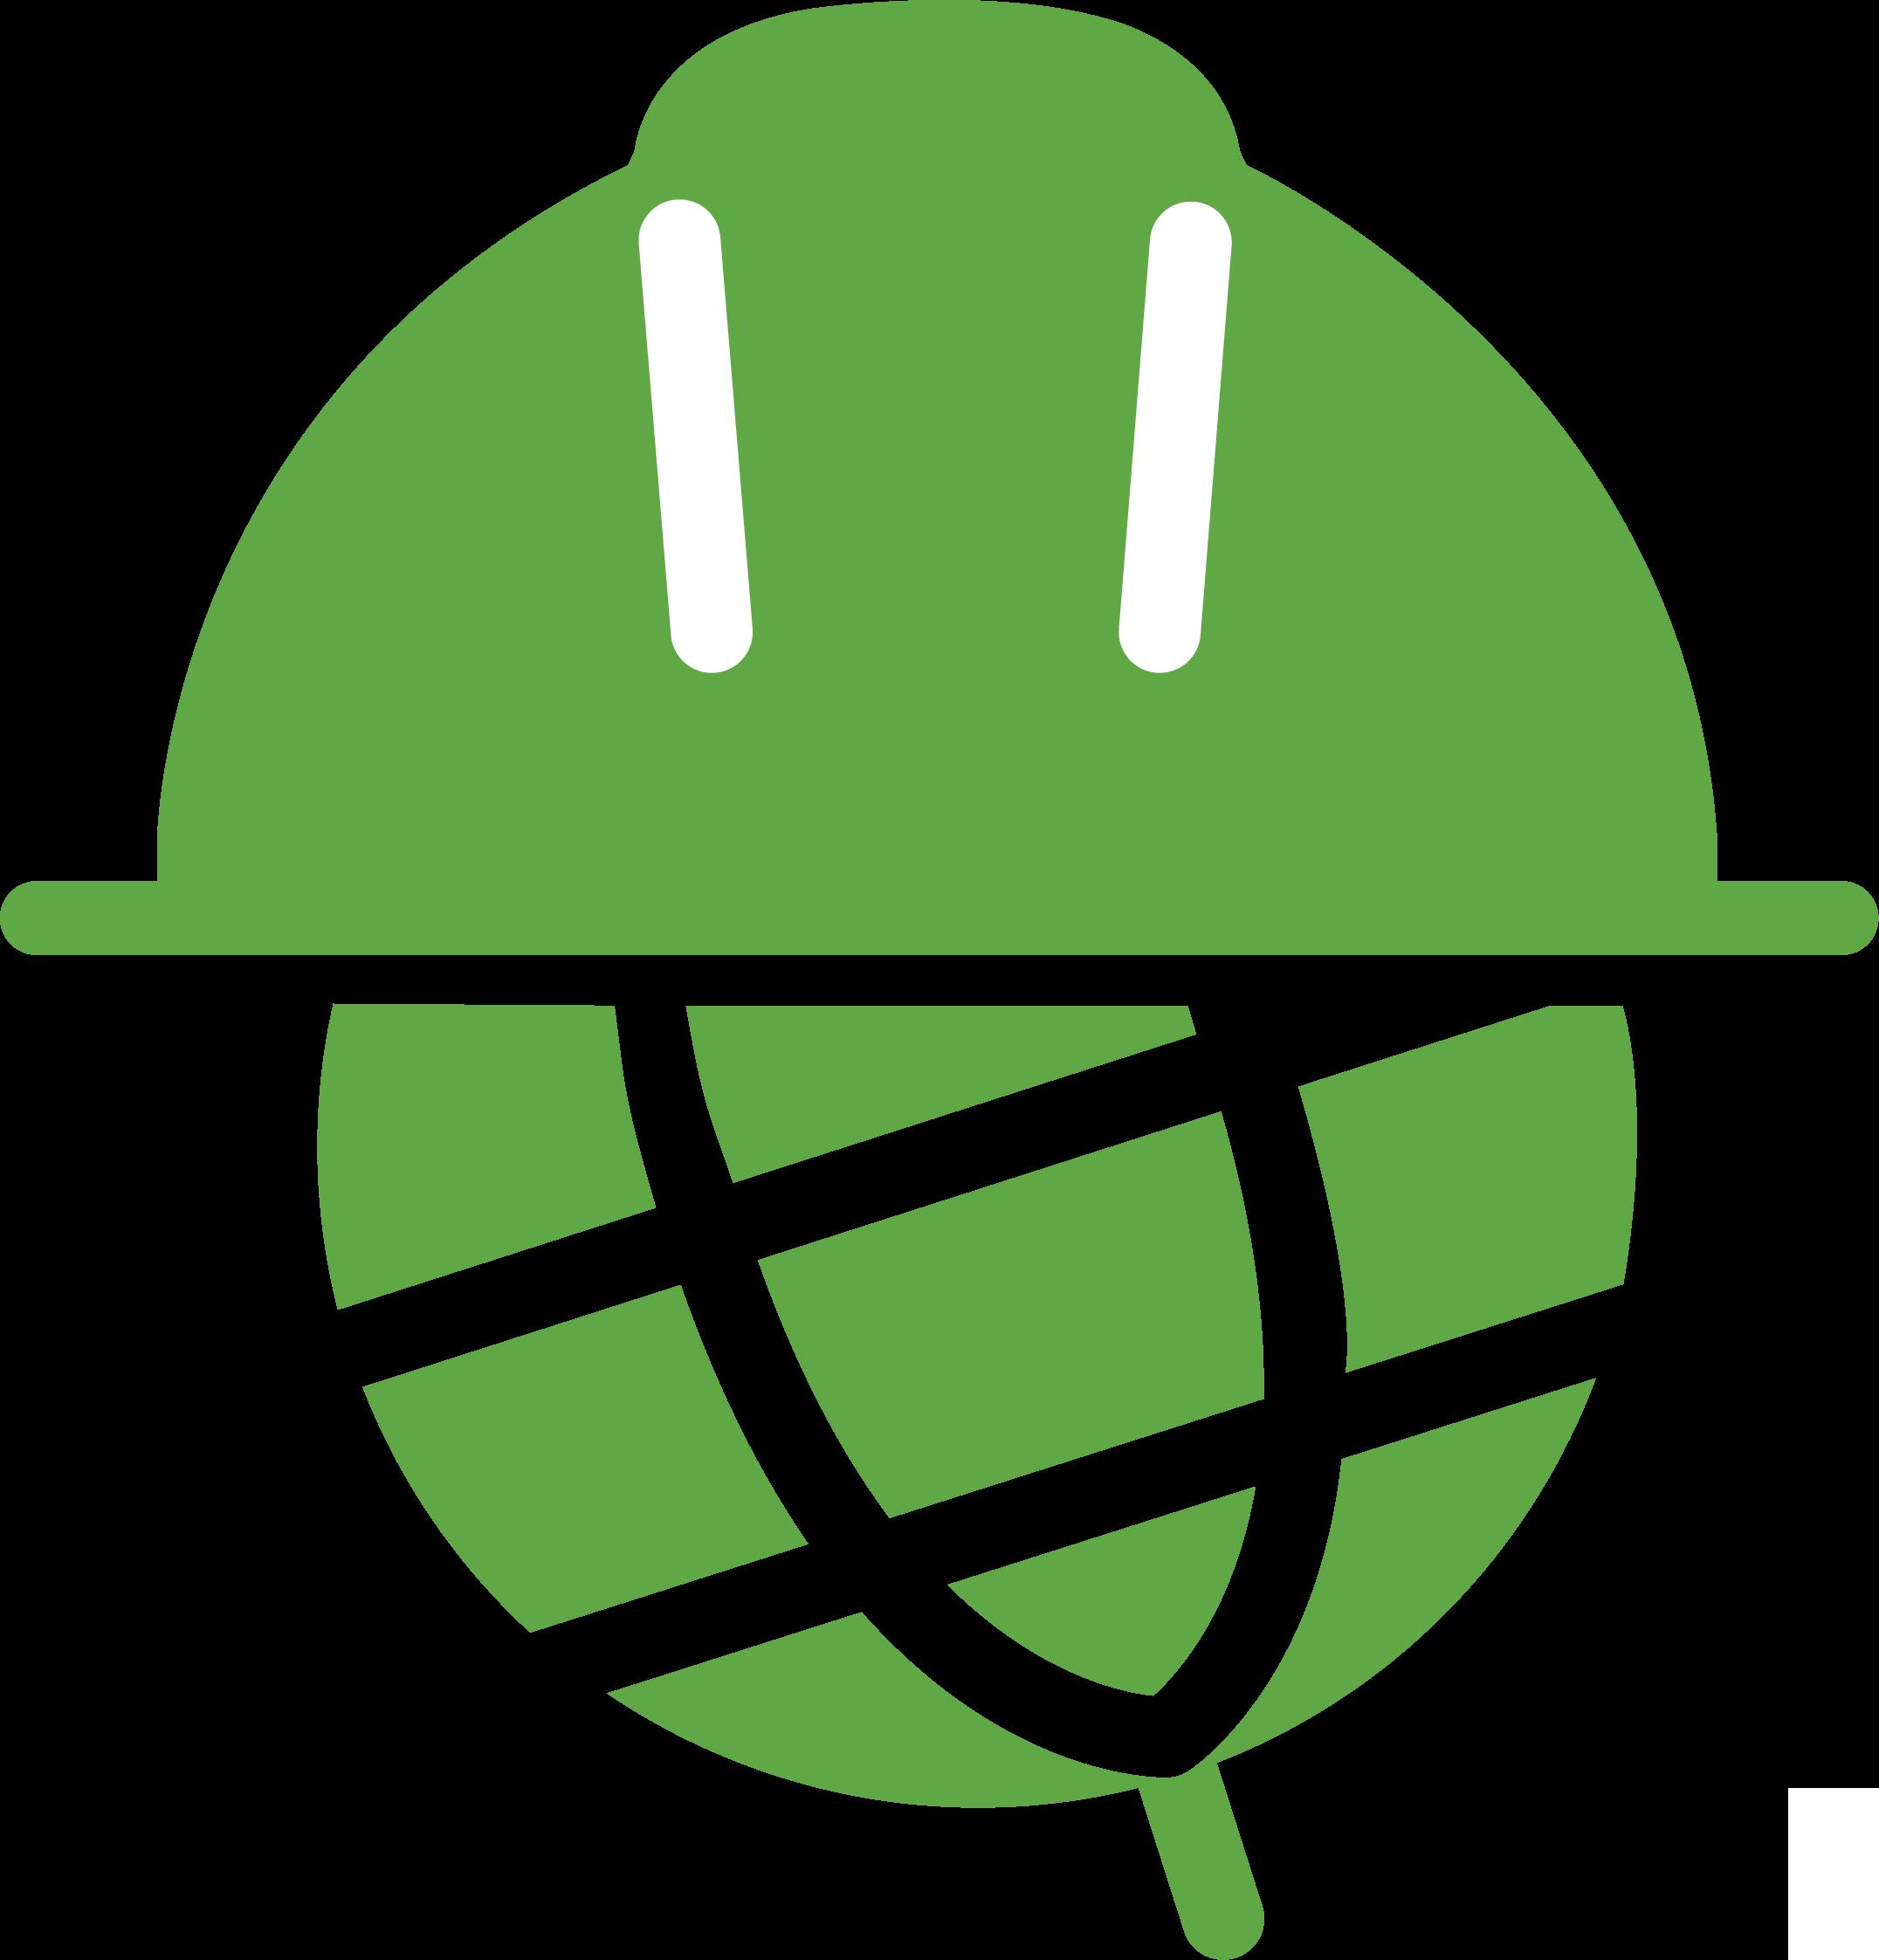 Global_Construction_Fill_Green369